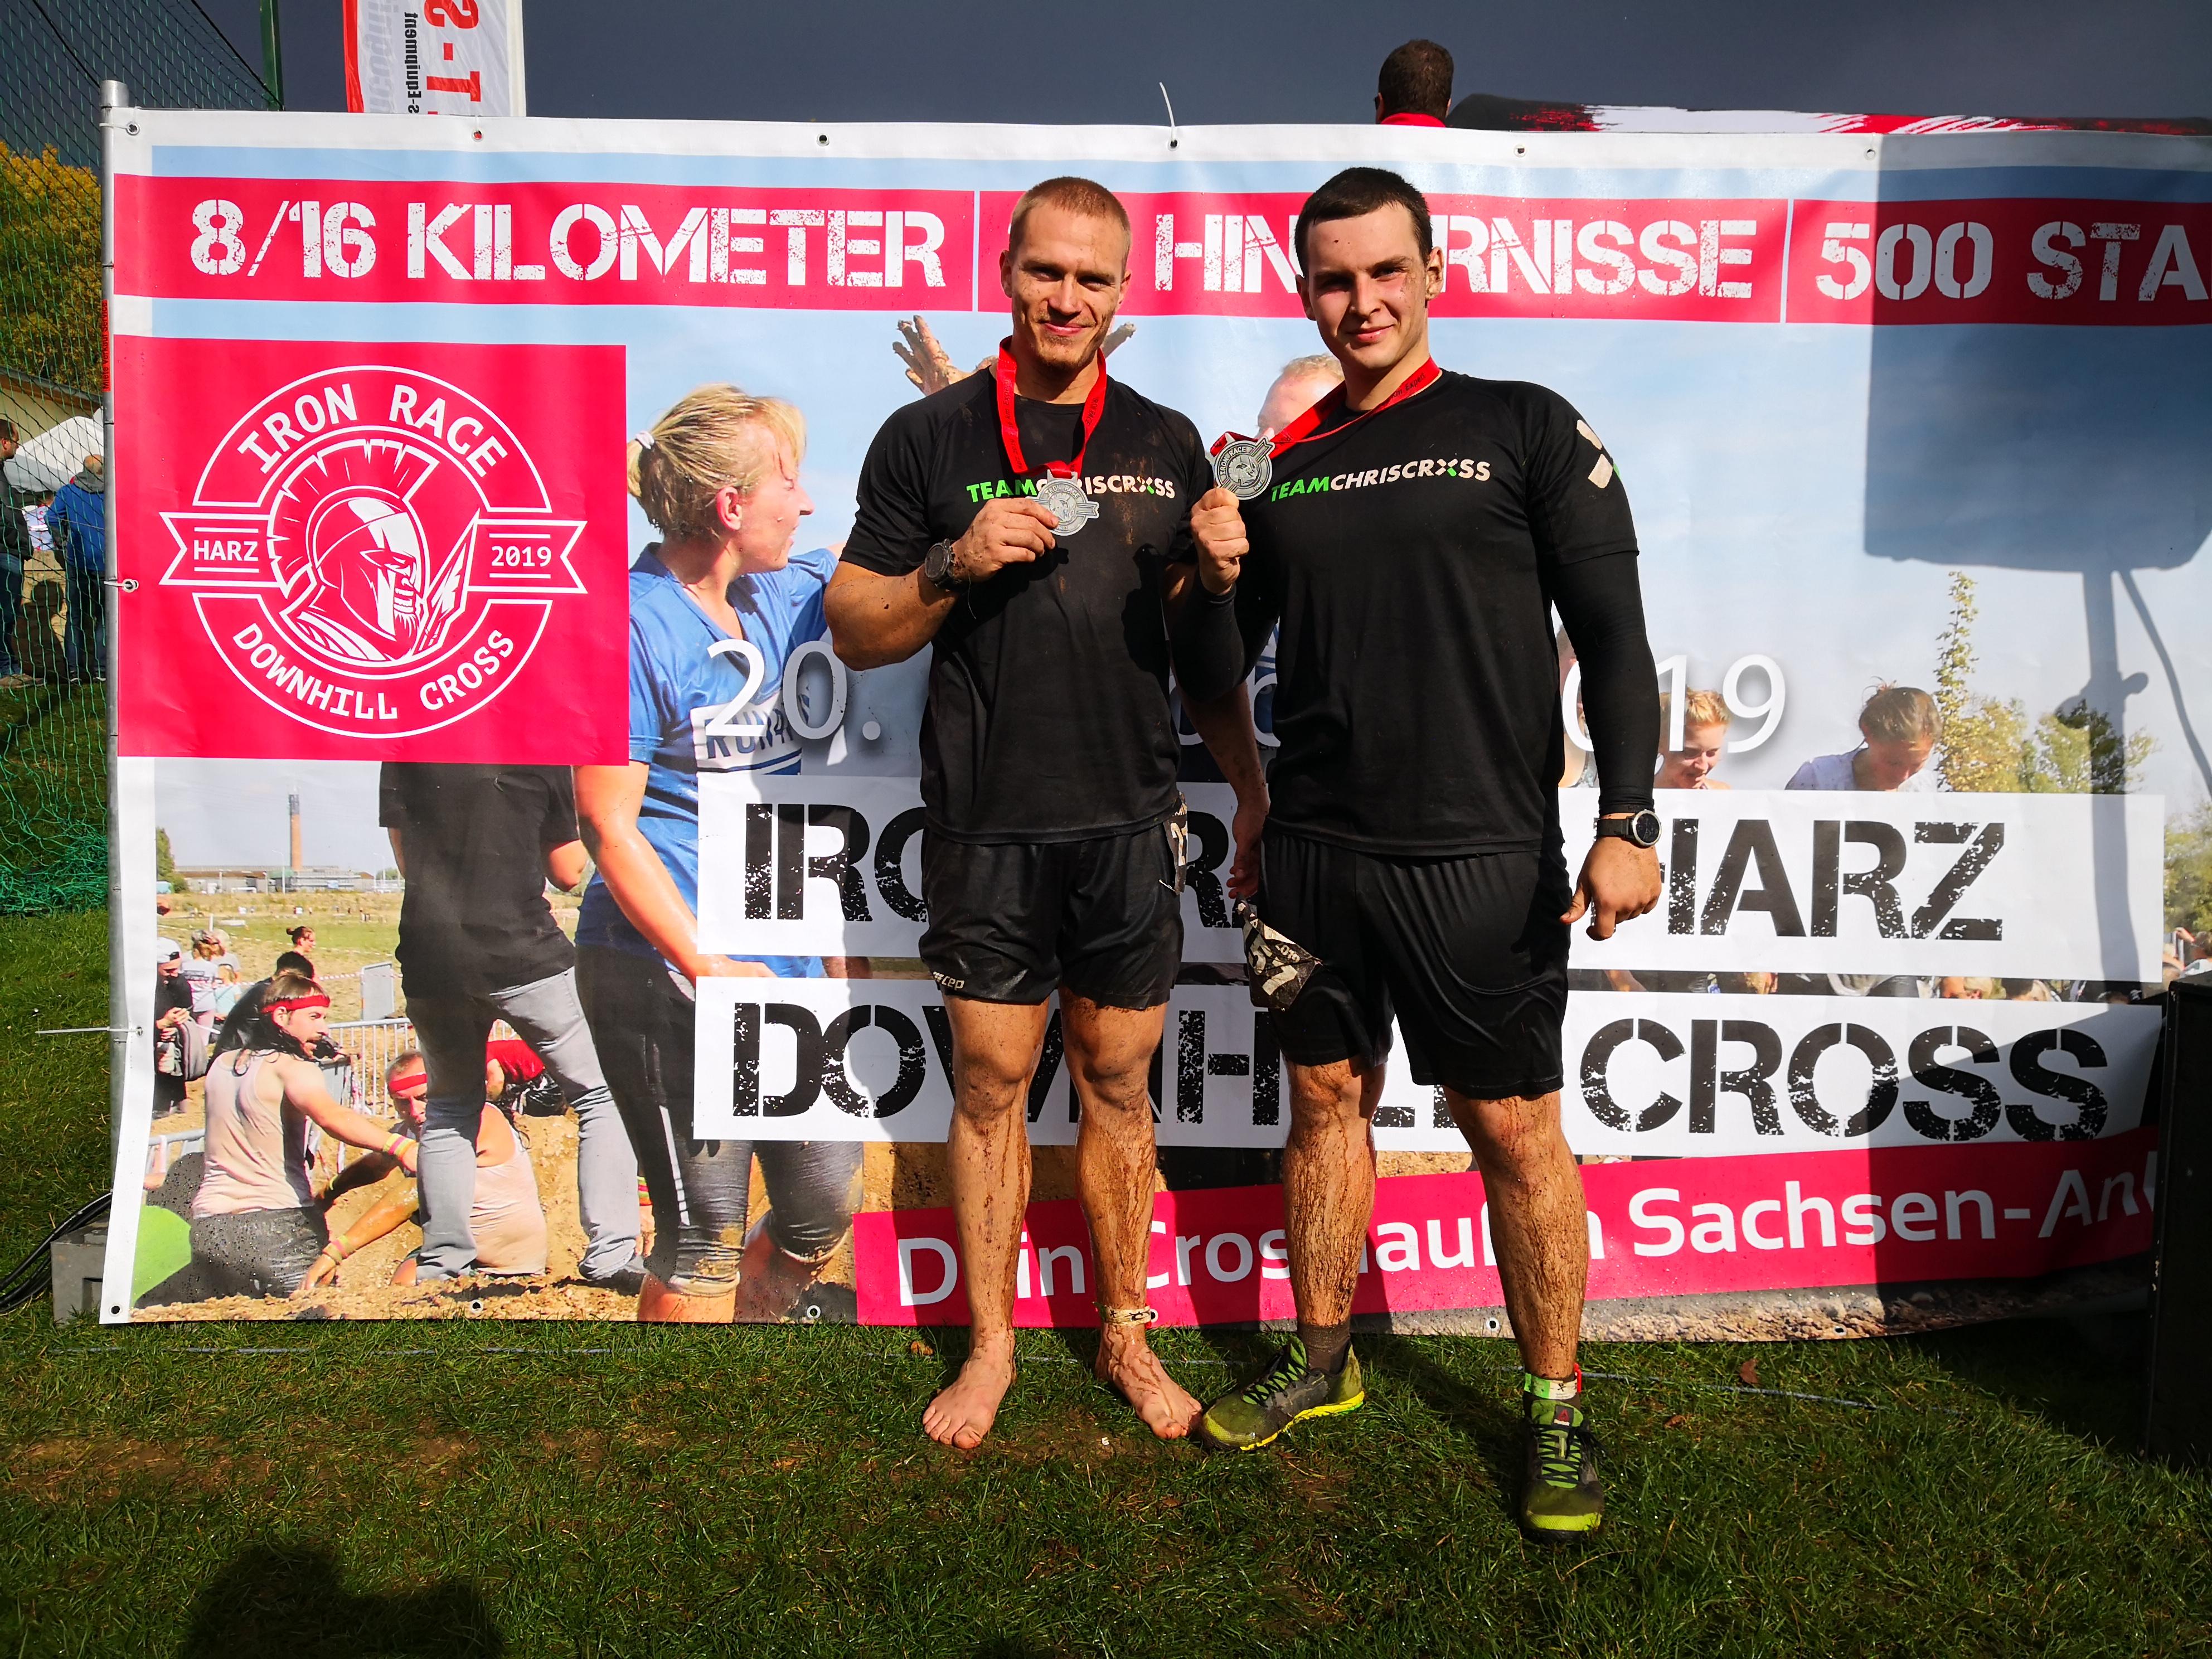 1. Iron Race Harz – Downhill Cross